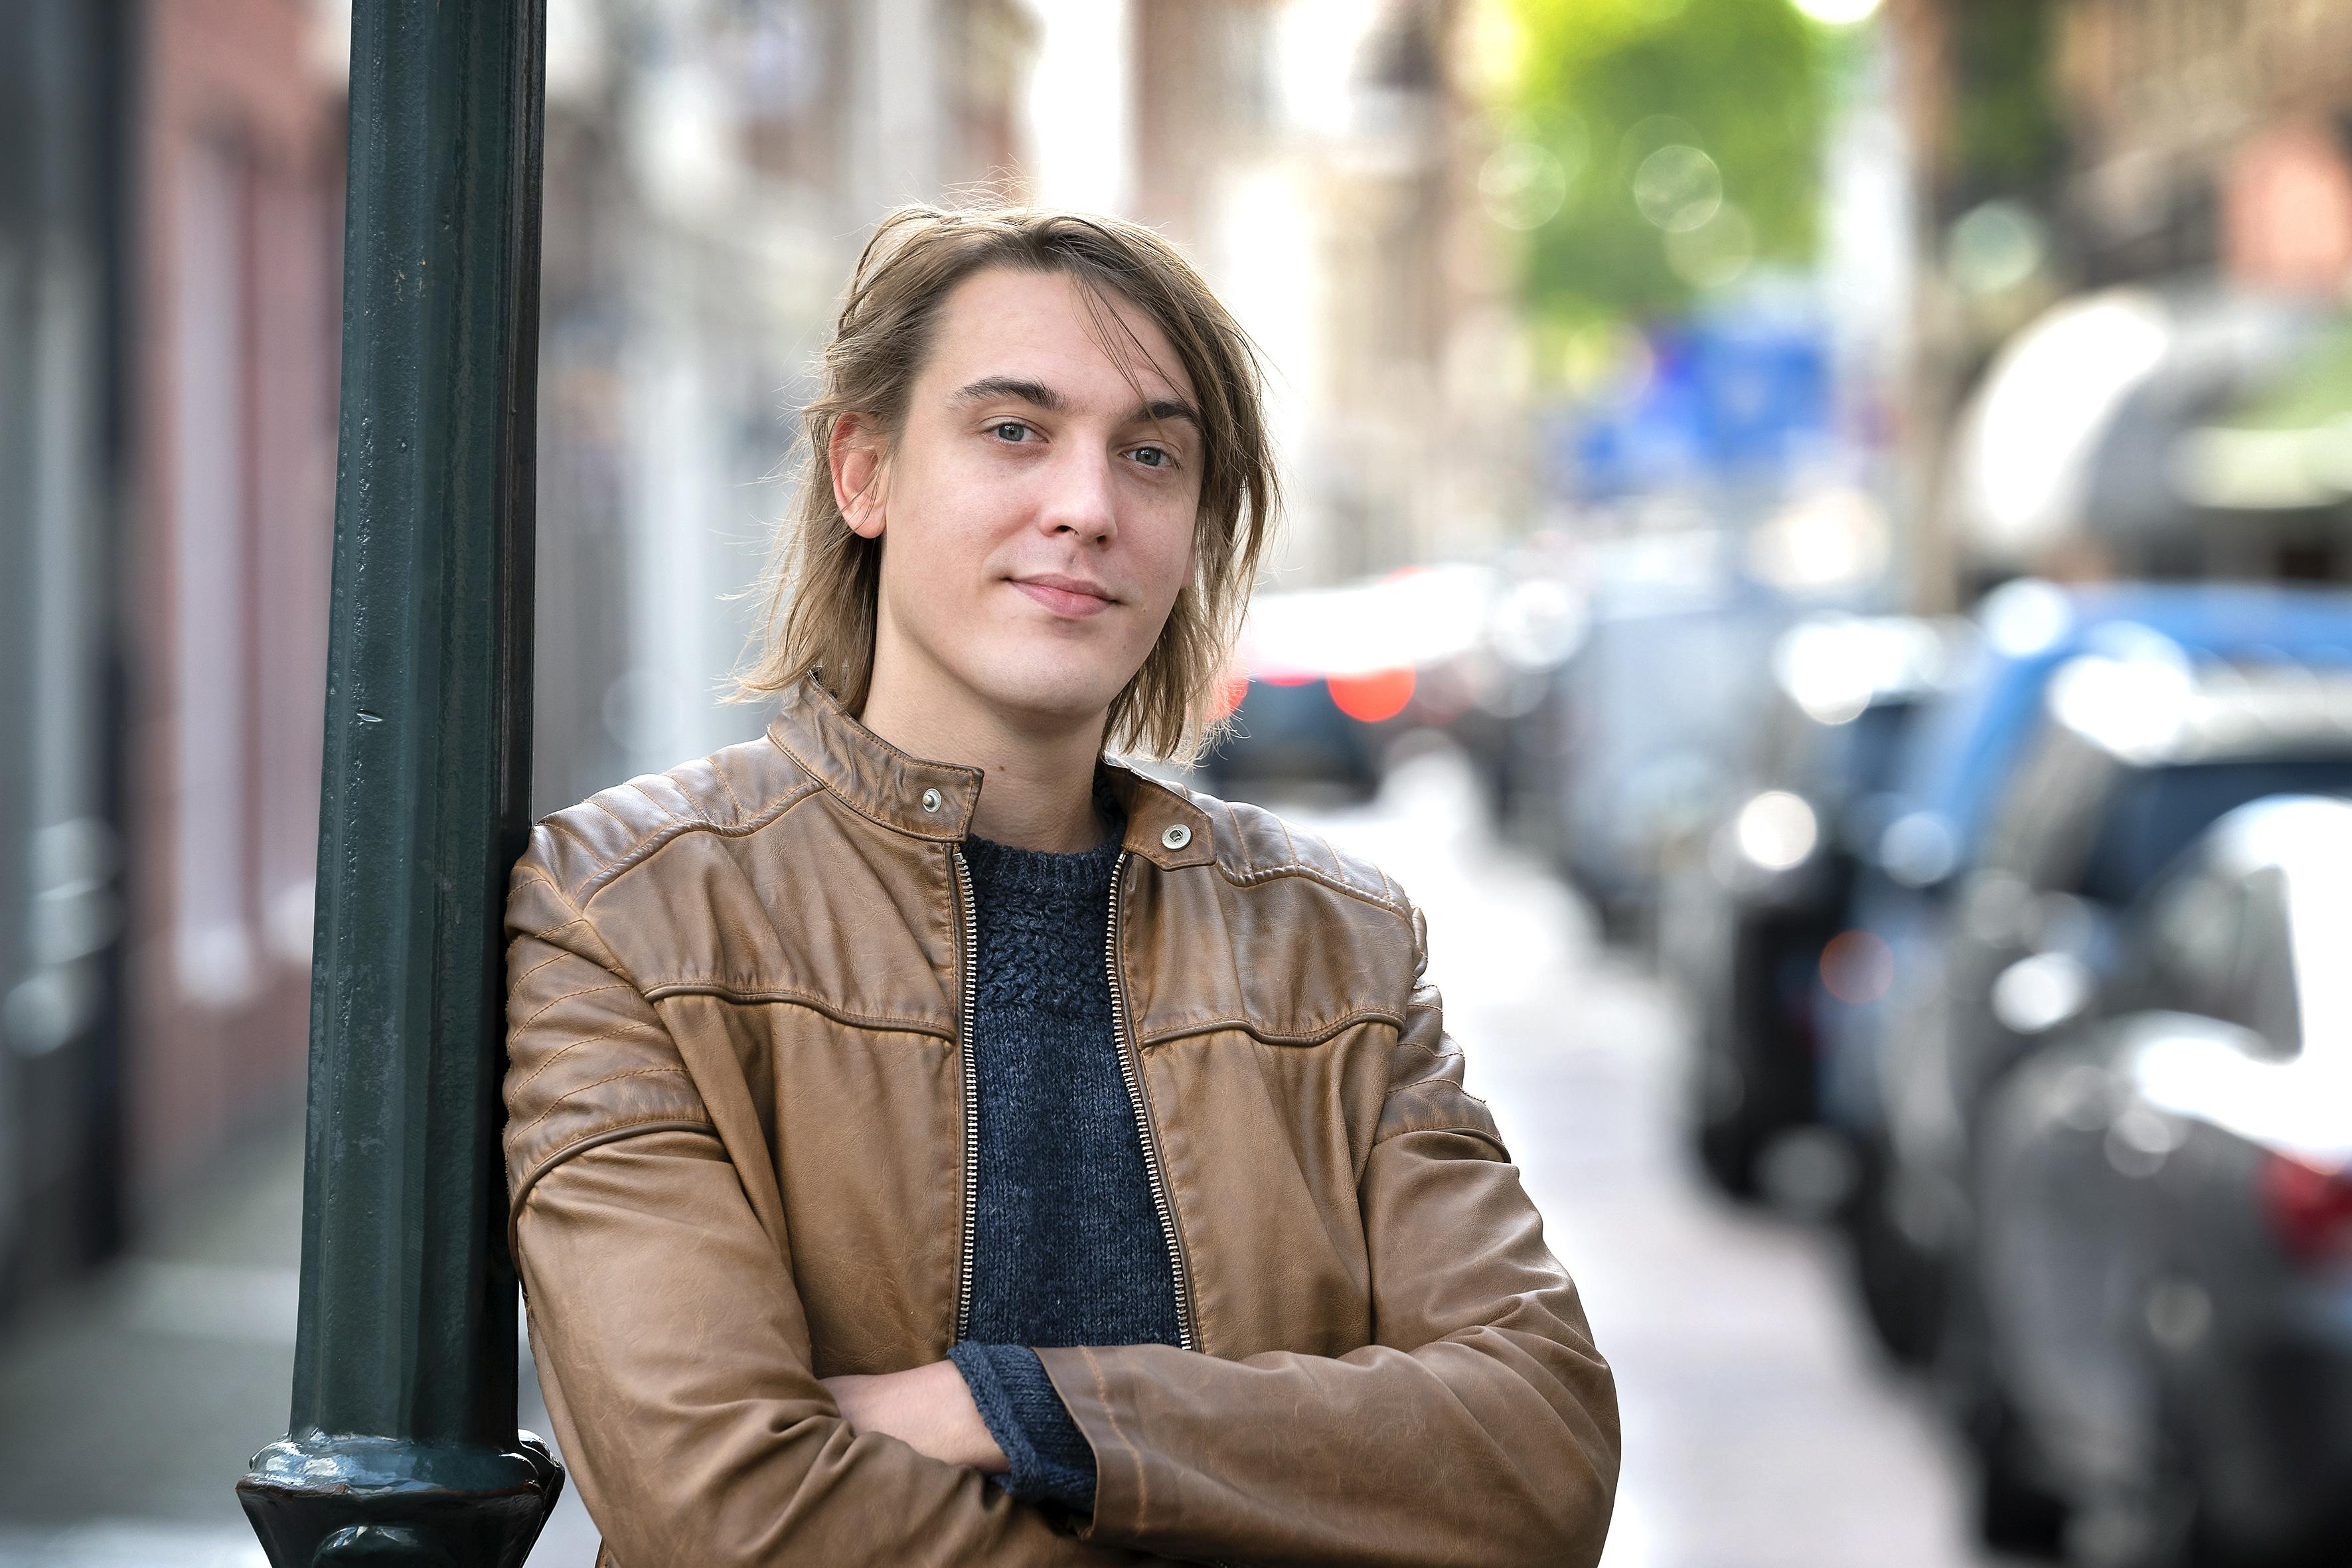 Kevin Stunnenberg verruilt ruige rock van Birth of Joy voor intieme liedjes als singer-songwriter